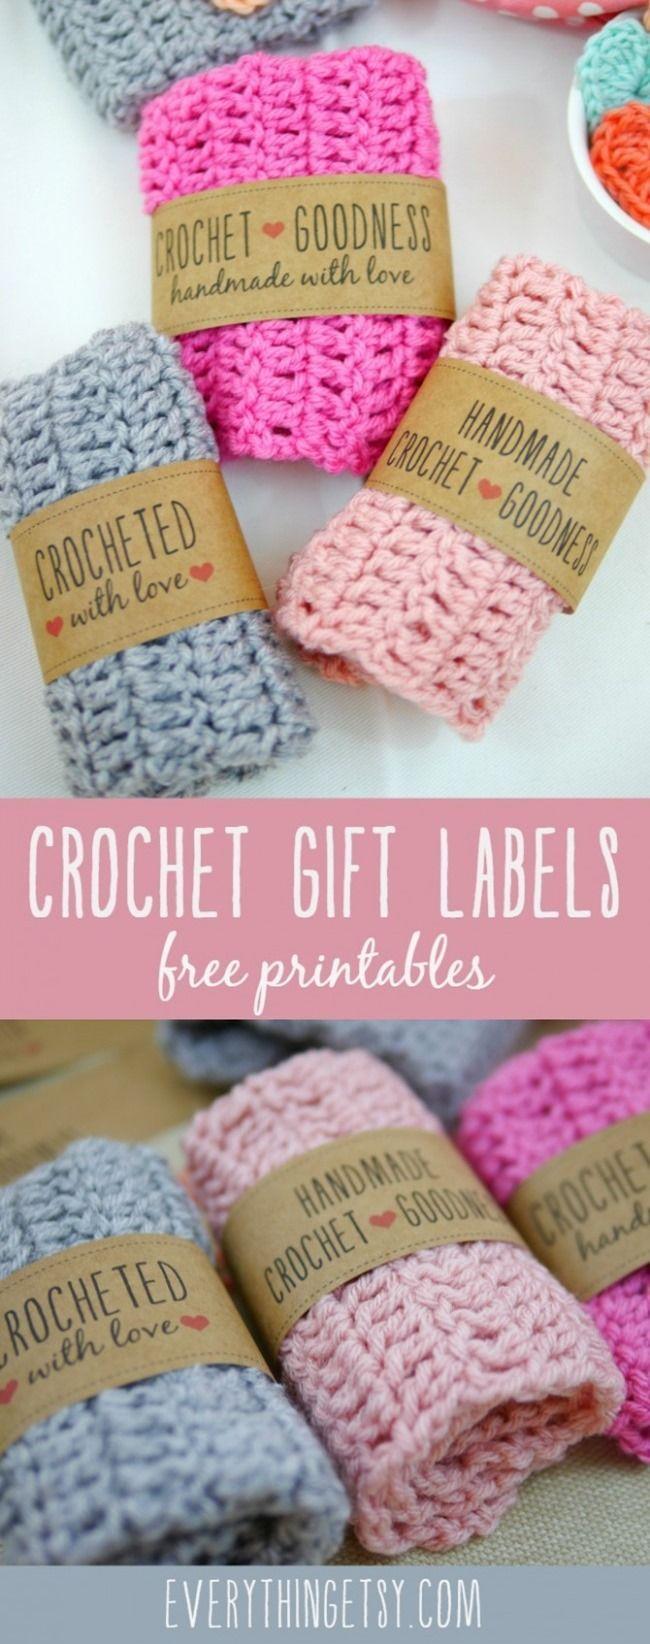 Free Printable Crochet Gift Labels - http://EverythingEtsy.com